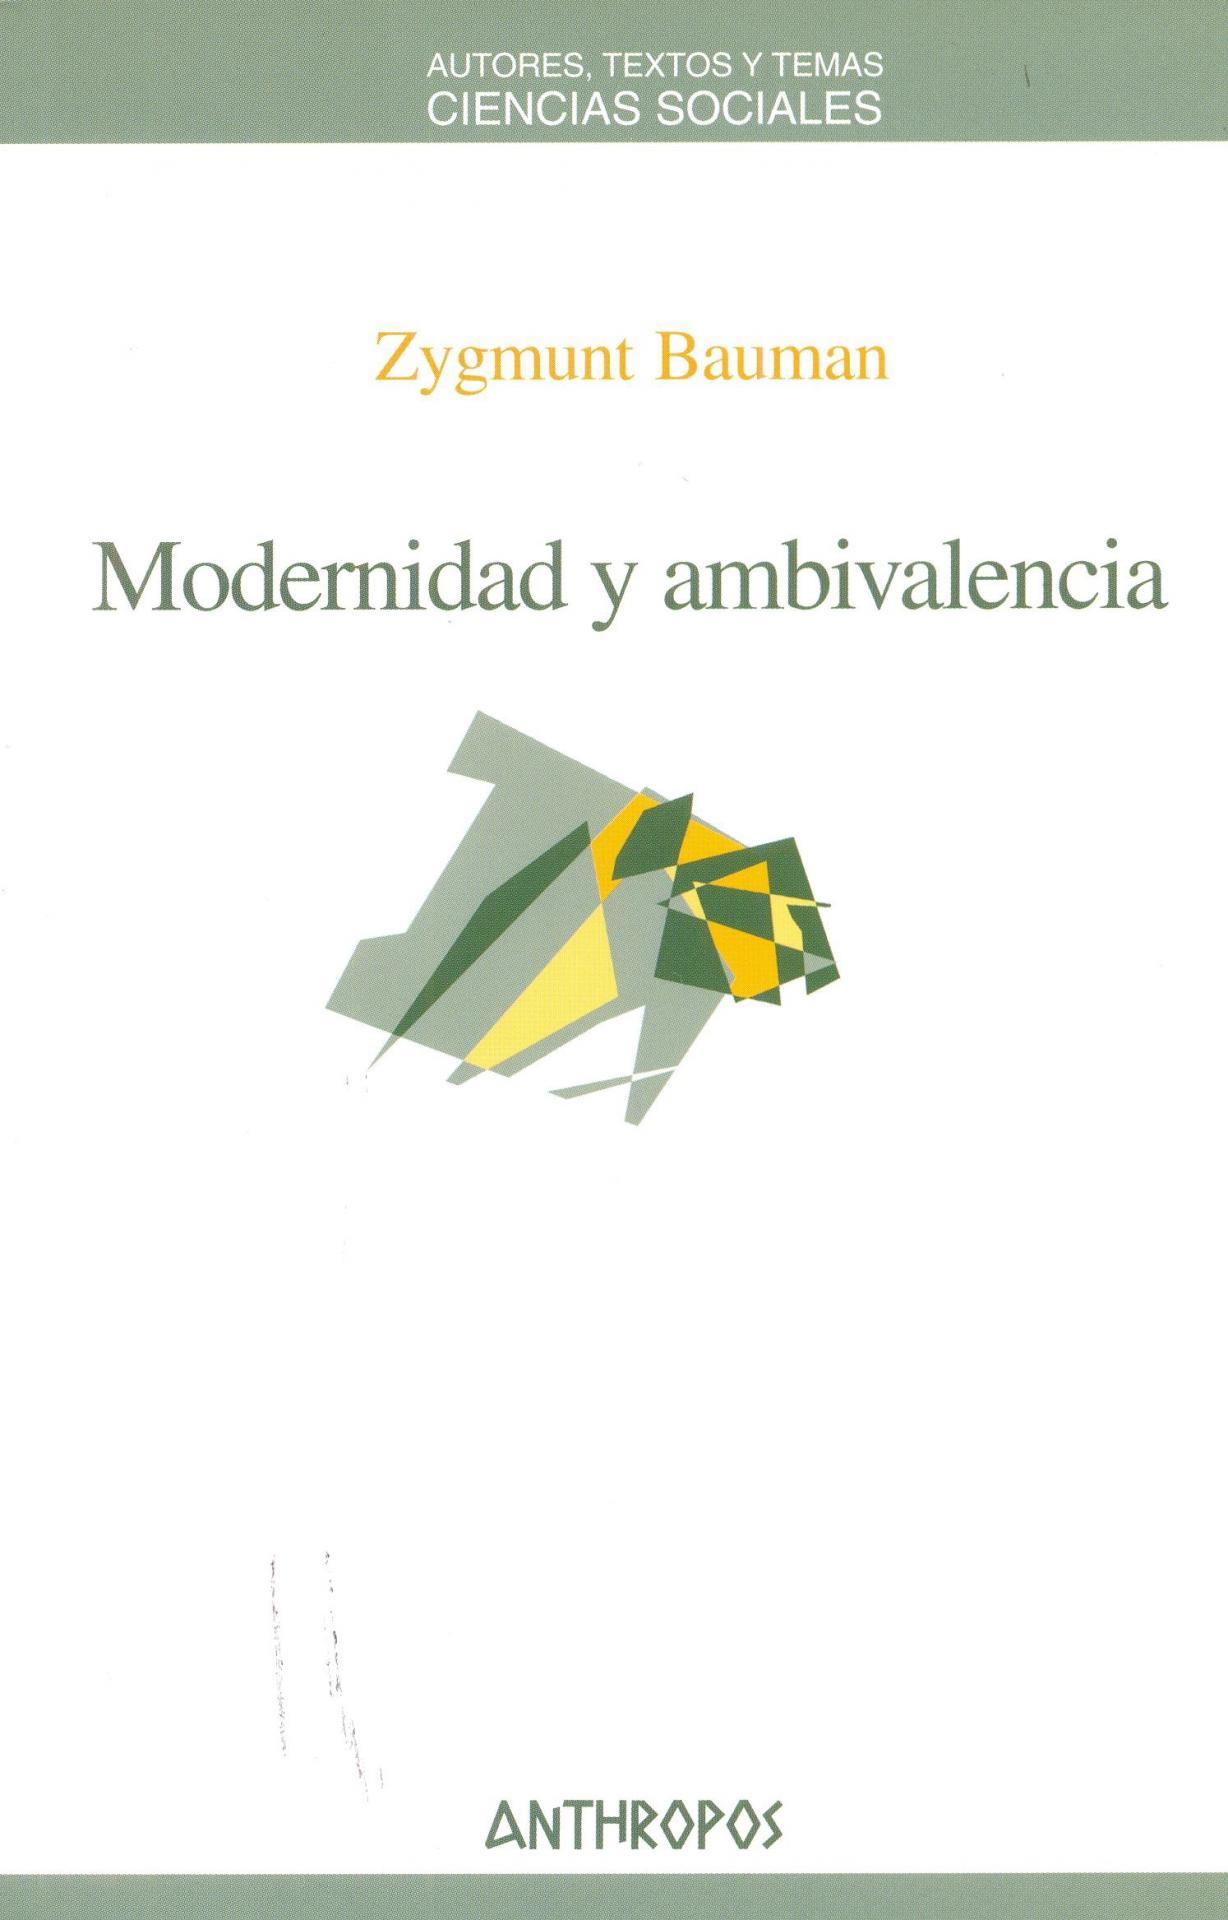 MODERNIDAD Y AMBIVALENCIA. Bauman, Z.